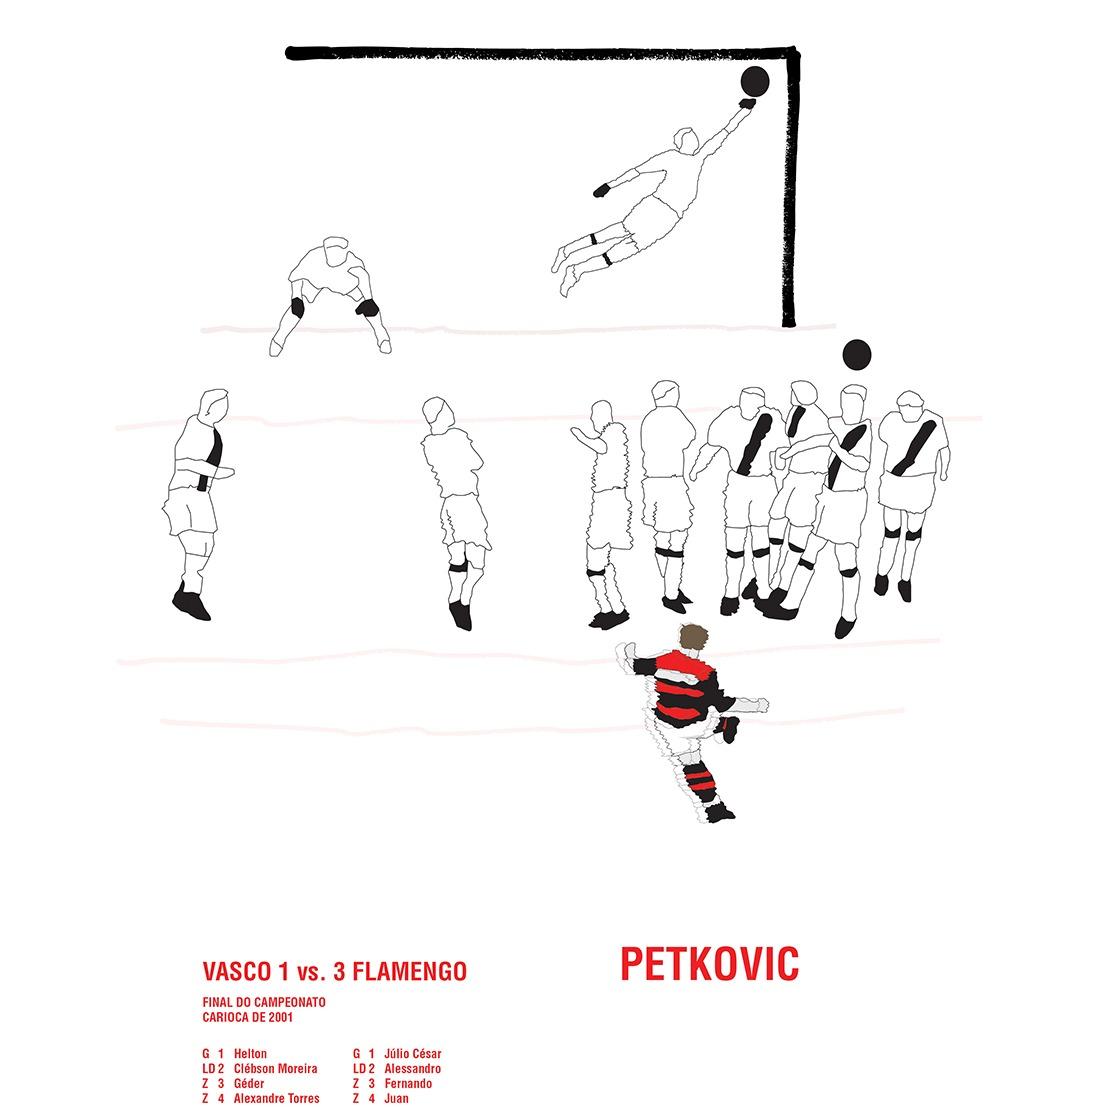 Dejan Petkovic - Campeonato Carioca 2001